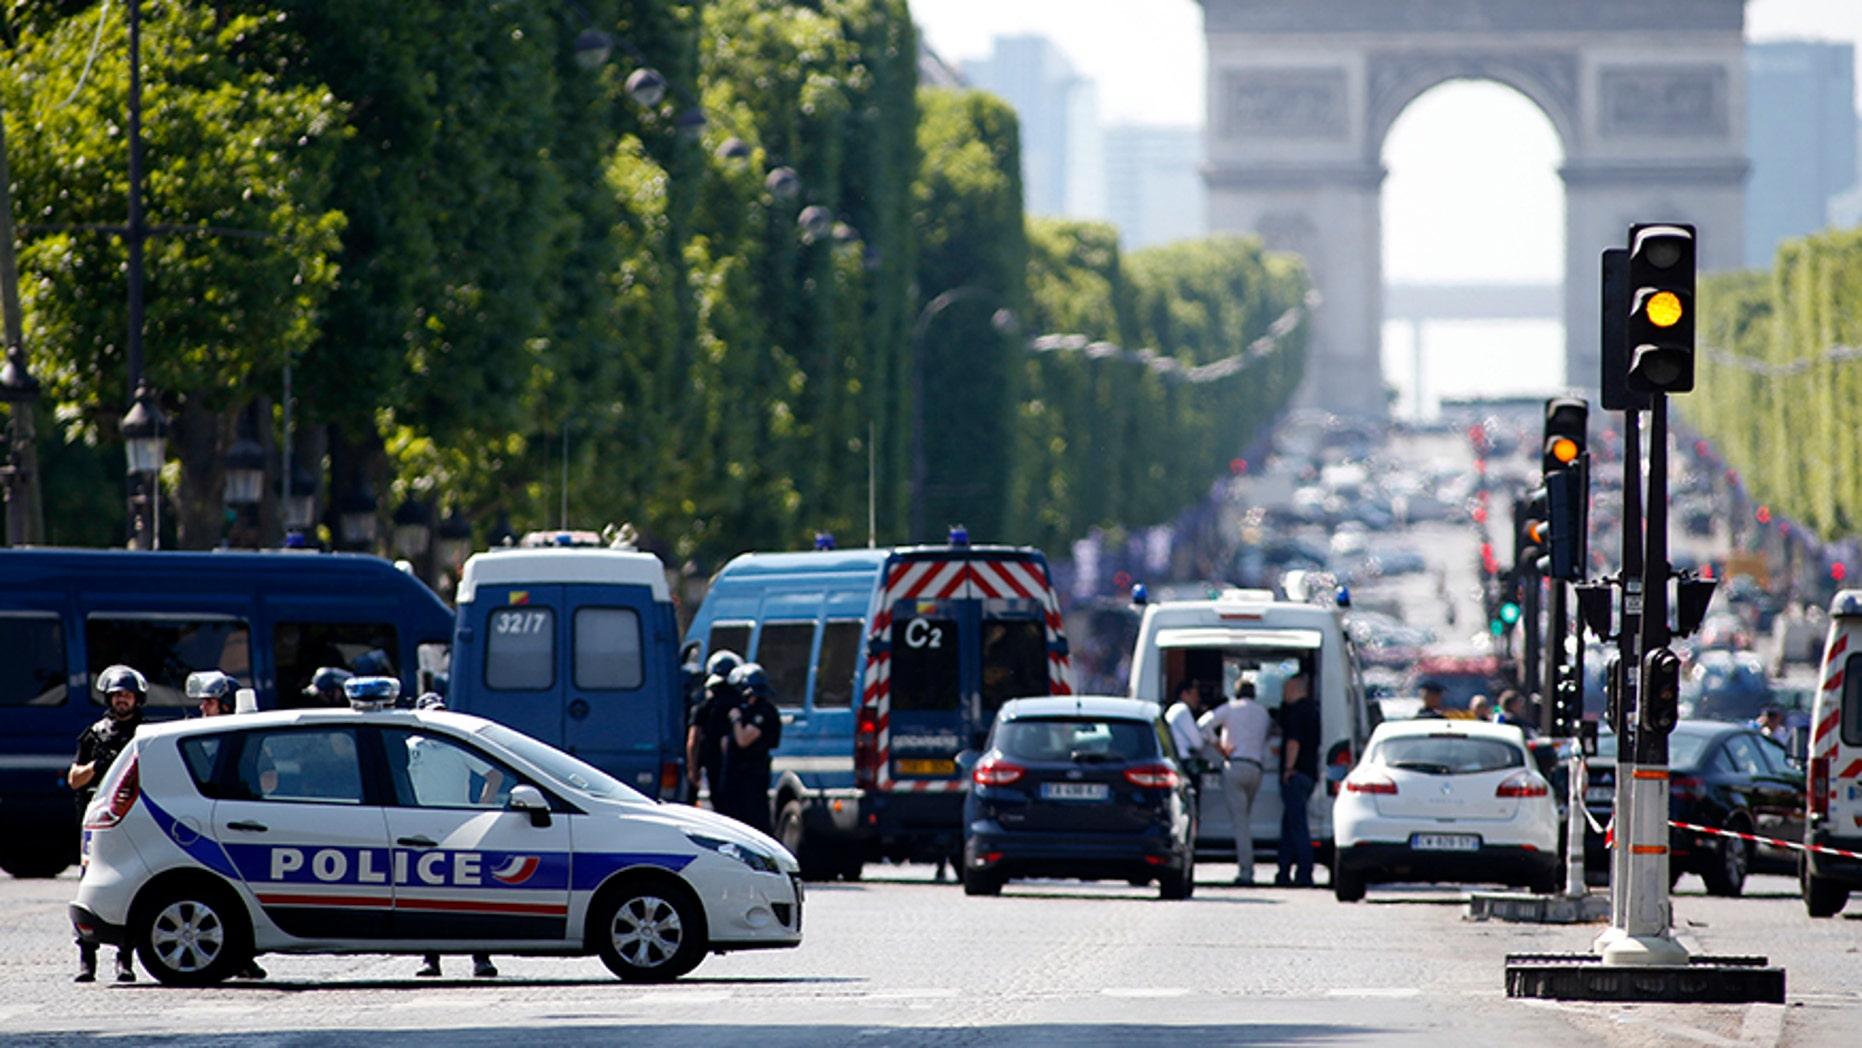 June 19, 2017: Police forces secure the area on the Champs Elysées in Paris.